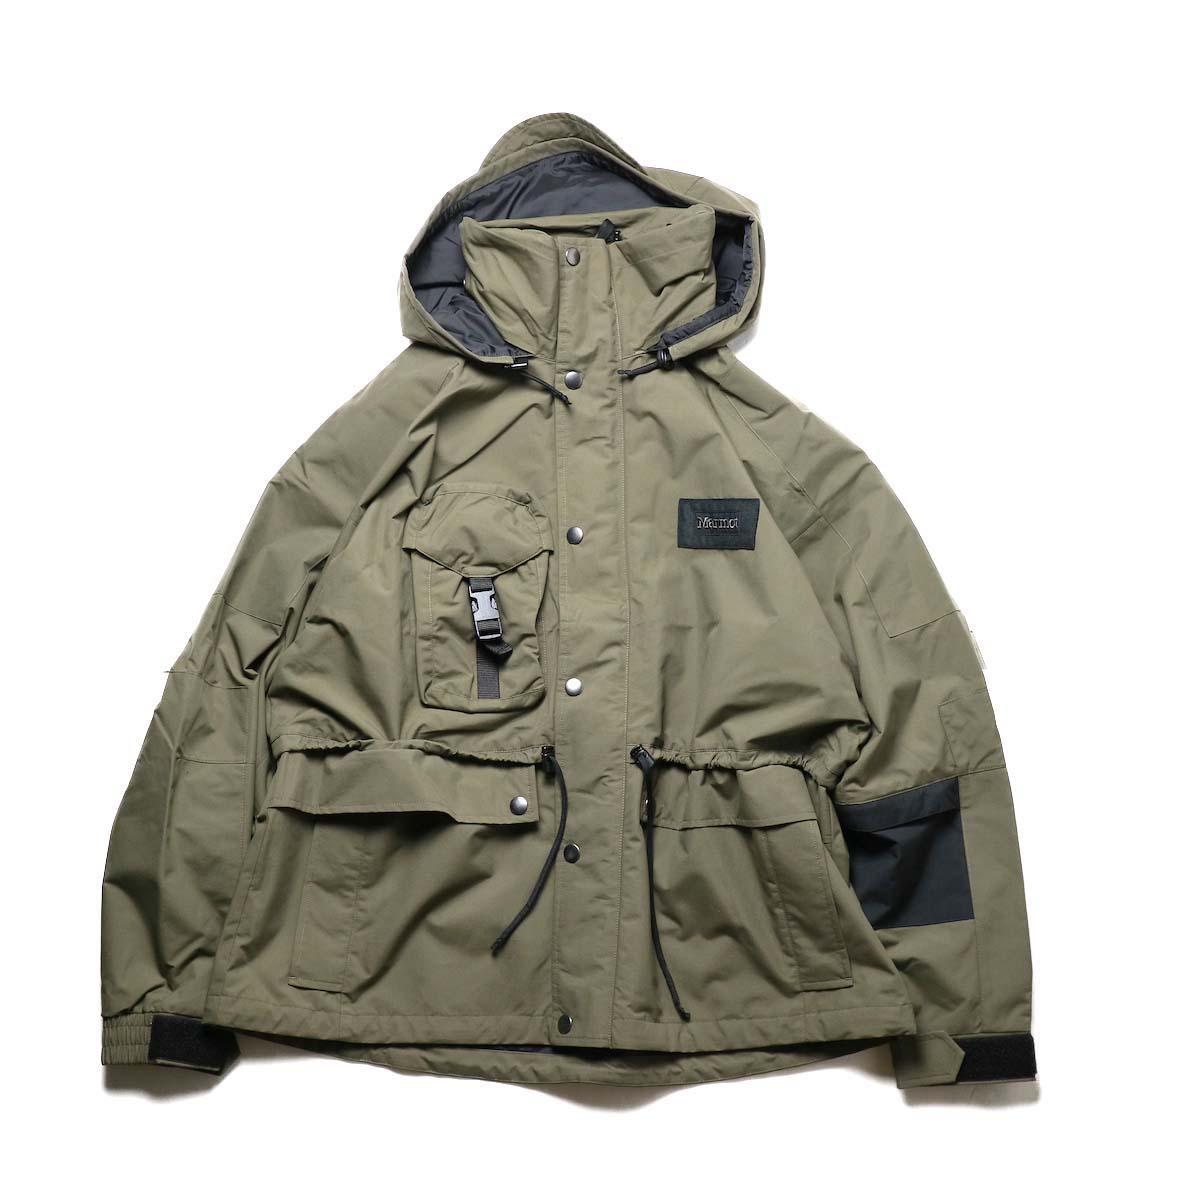 Marmot Histric Collection / Scranton Jacket (Olive/Black)